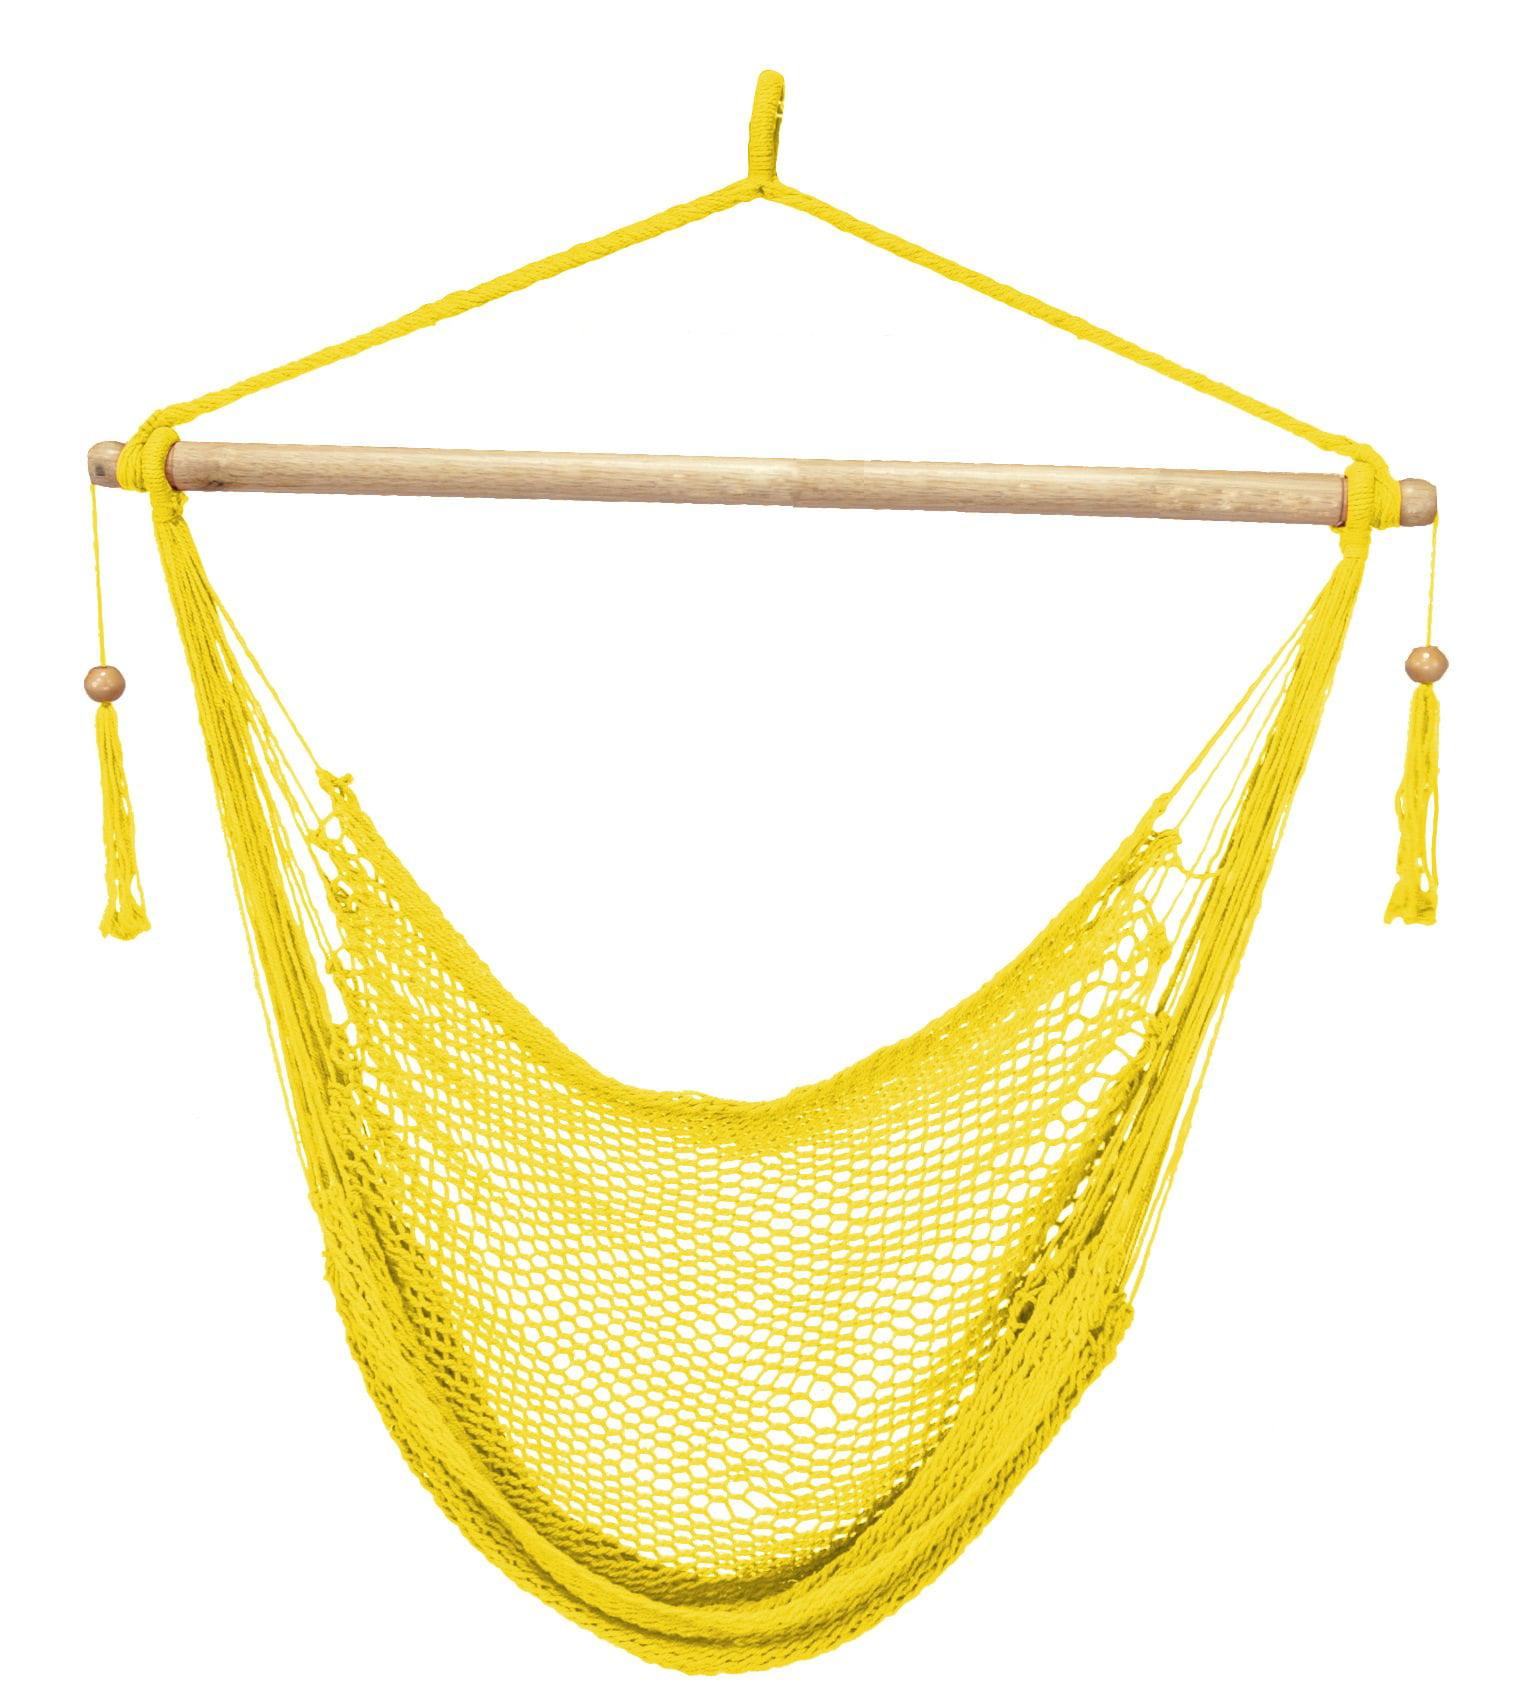 Island Paradise Rope Hammock Chair - Yellow